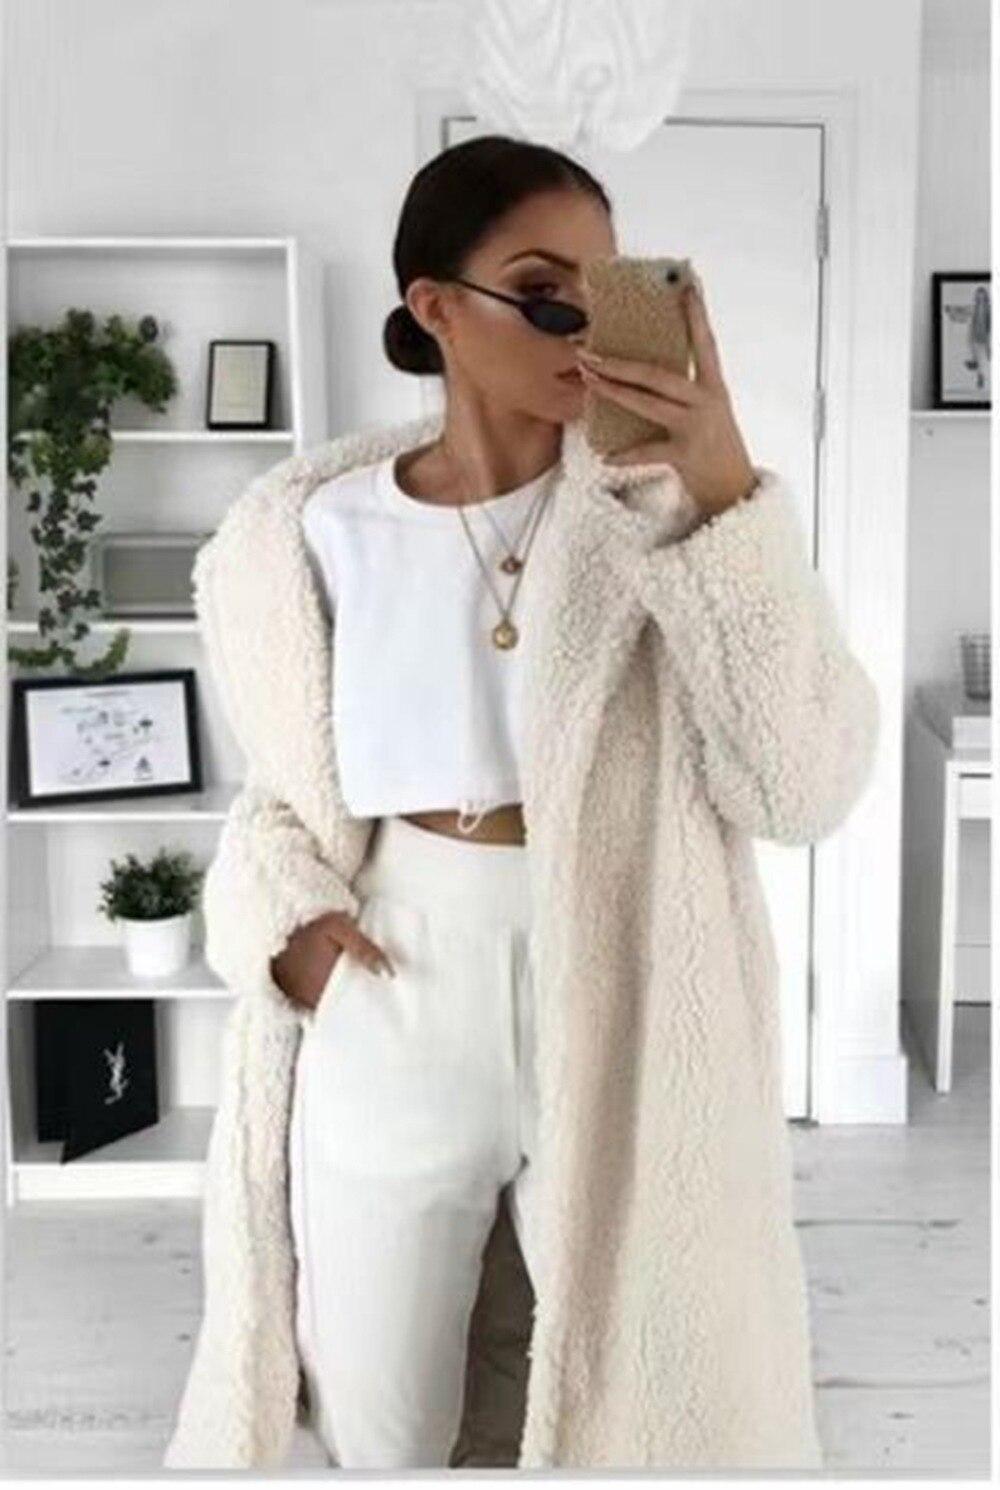 OEAK Autumn Winter Fur Women 2019 Casual Loose Solid Long Teddy Coat Female Vintage Thick Faux Fur Jackets Plush Overcoat